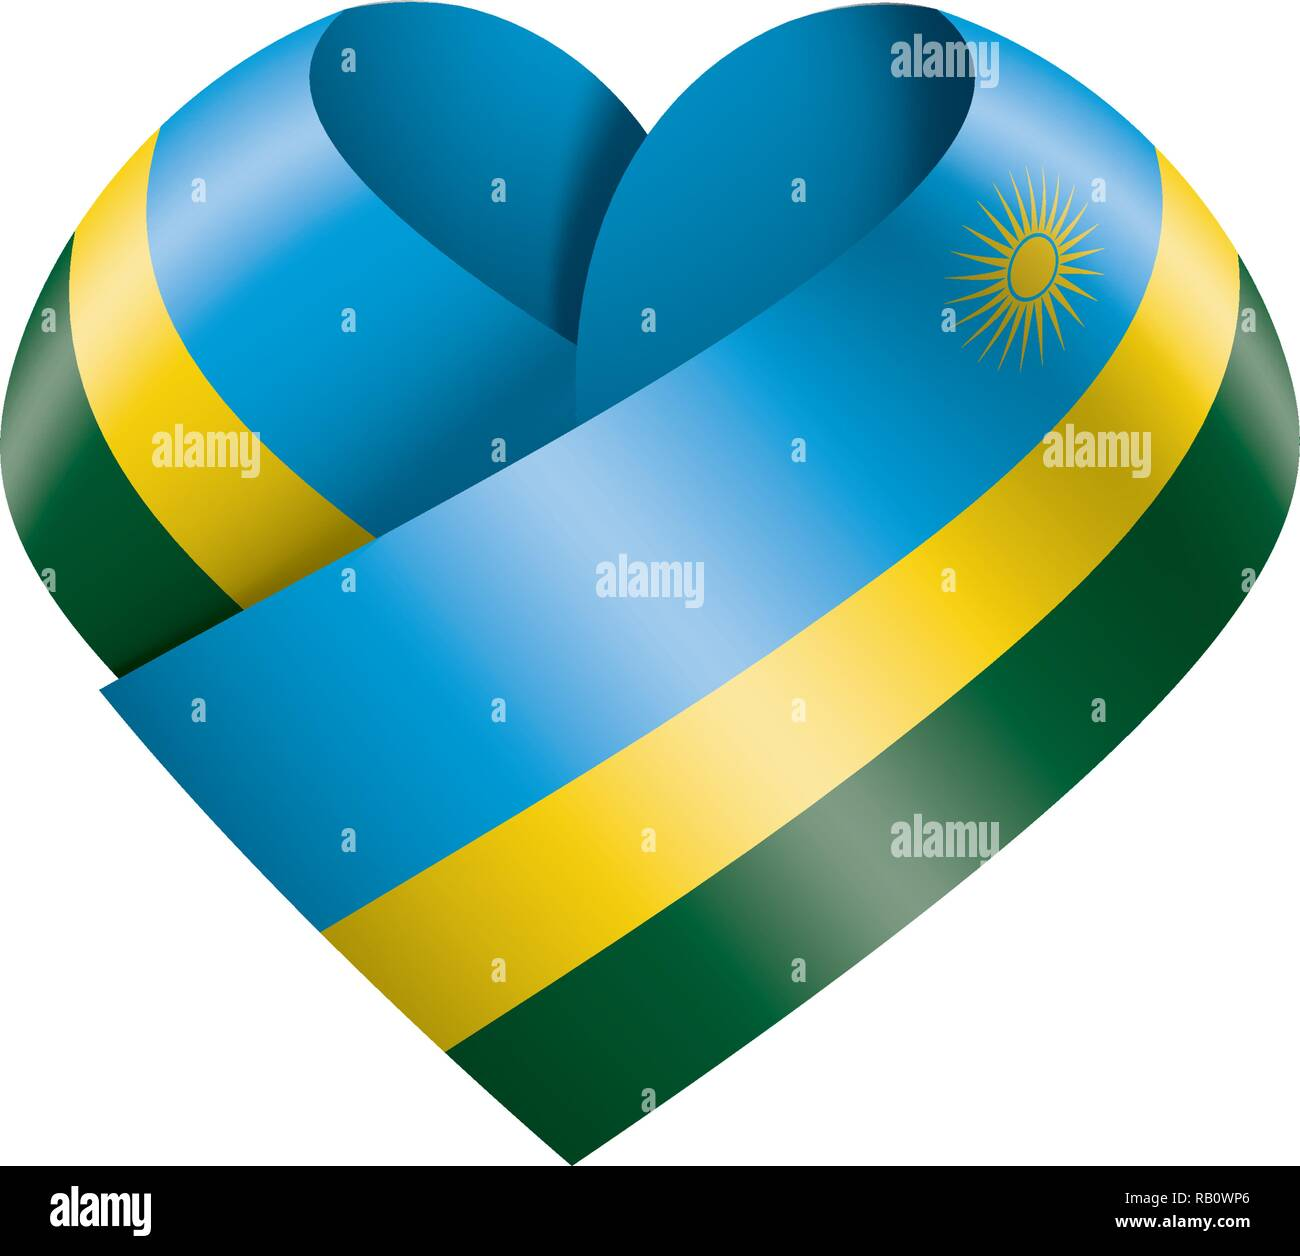 Rwanda flag, vector illustration on a white background - Stock Image